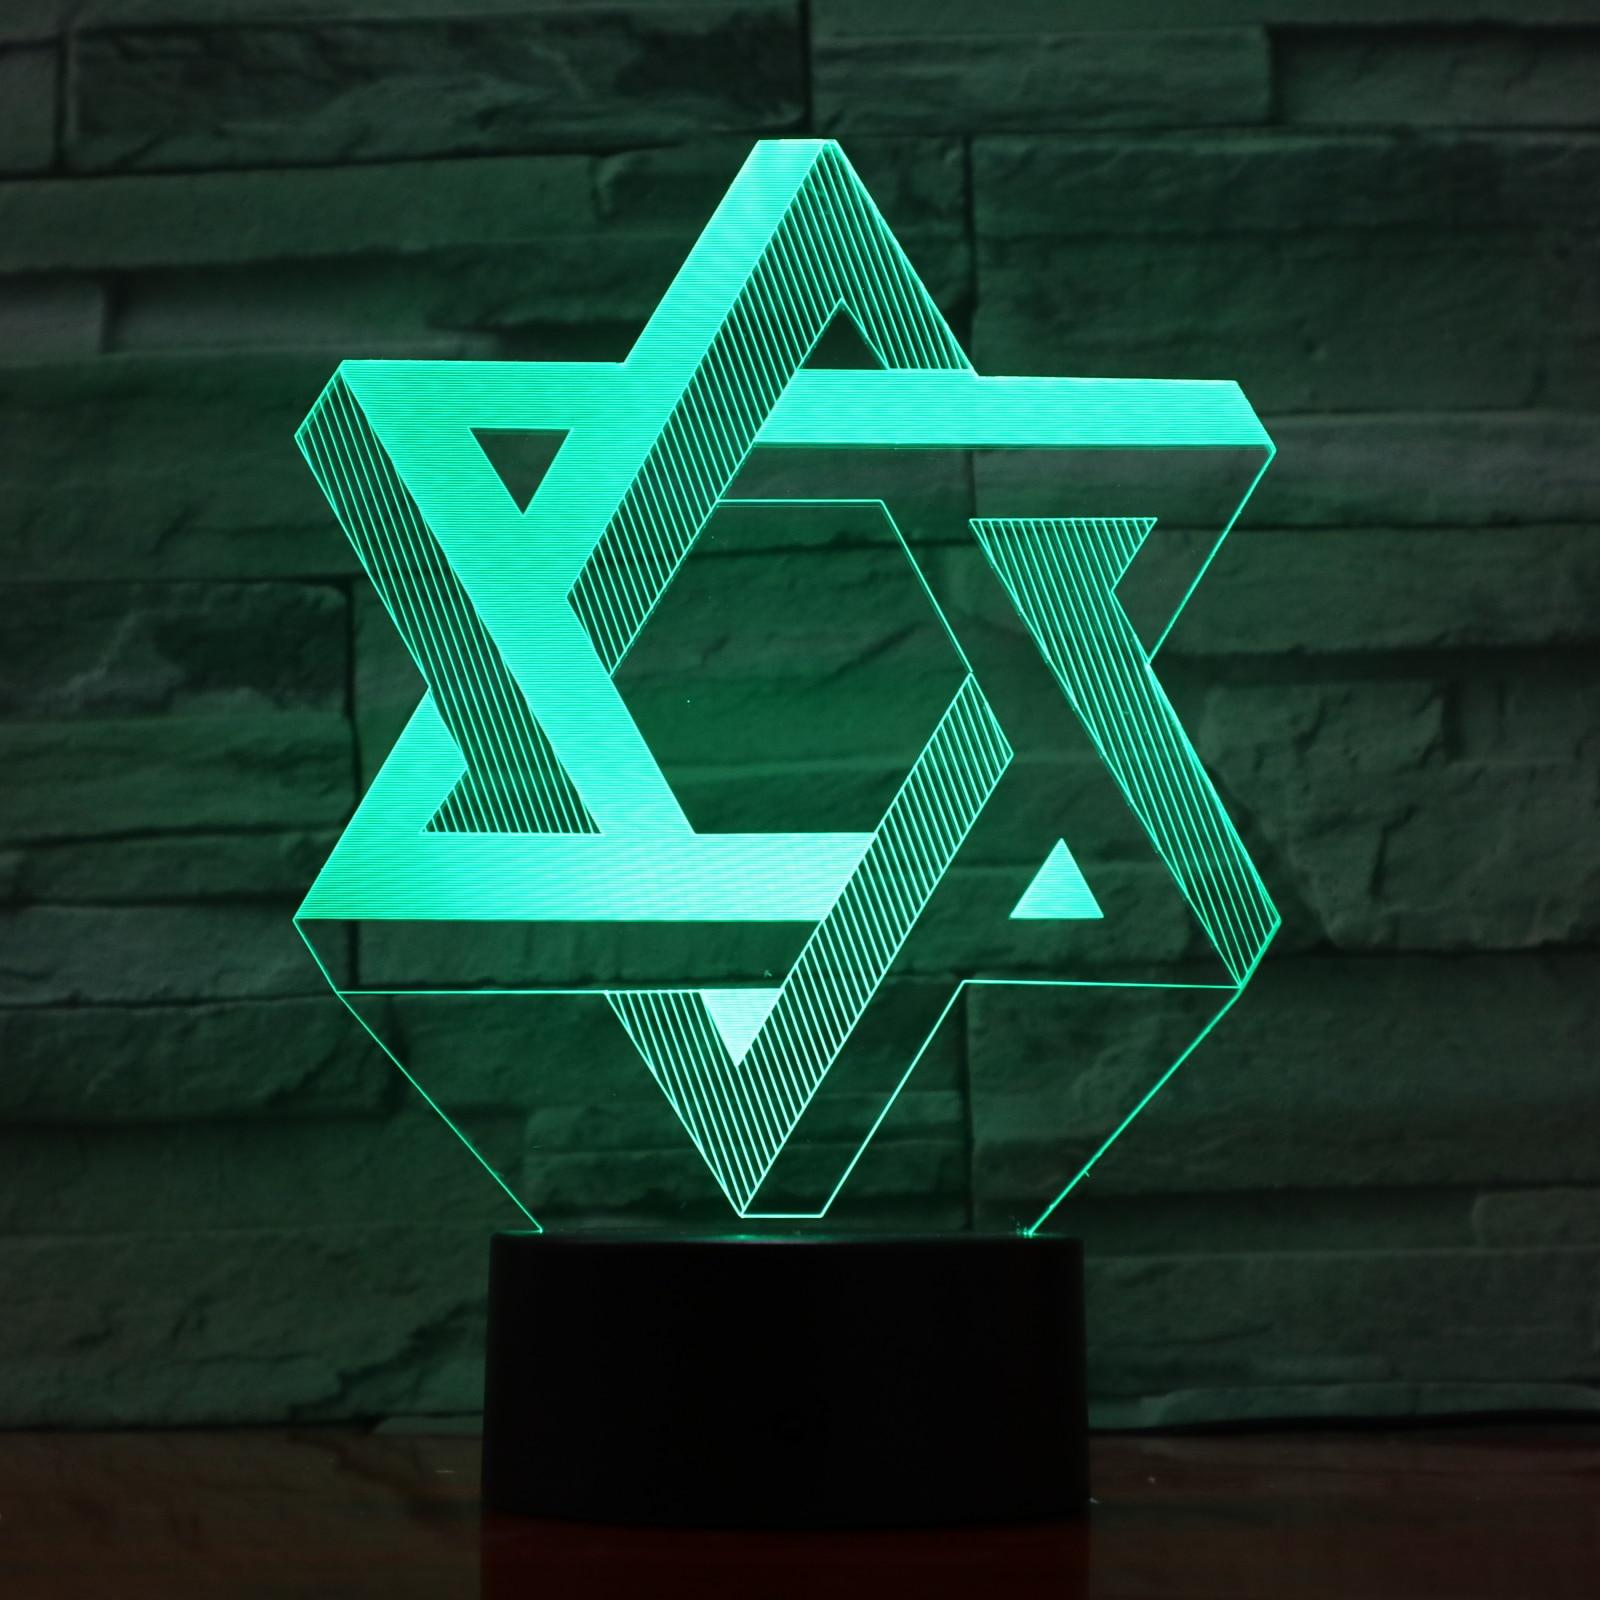 Novelty Lights Star Of David Bedroom Decorative 3d Lamp Child Baby Nightlight Cool Kids Gift 3D Illusion Led Night Light Lamp